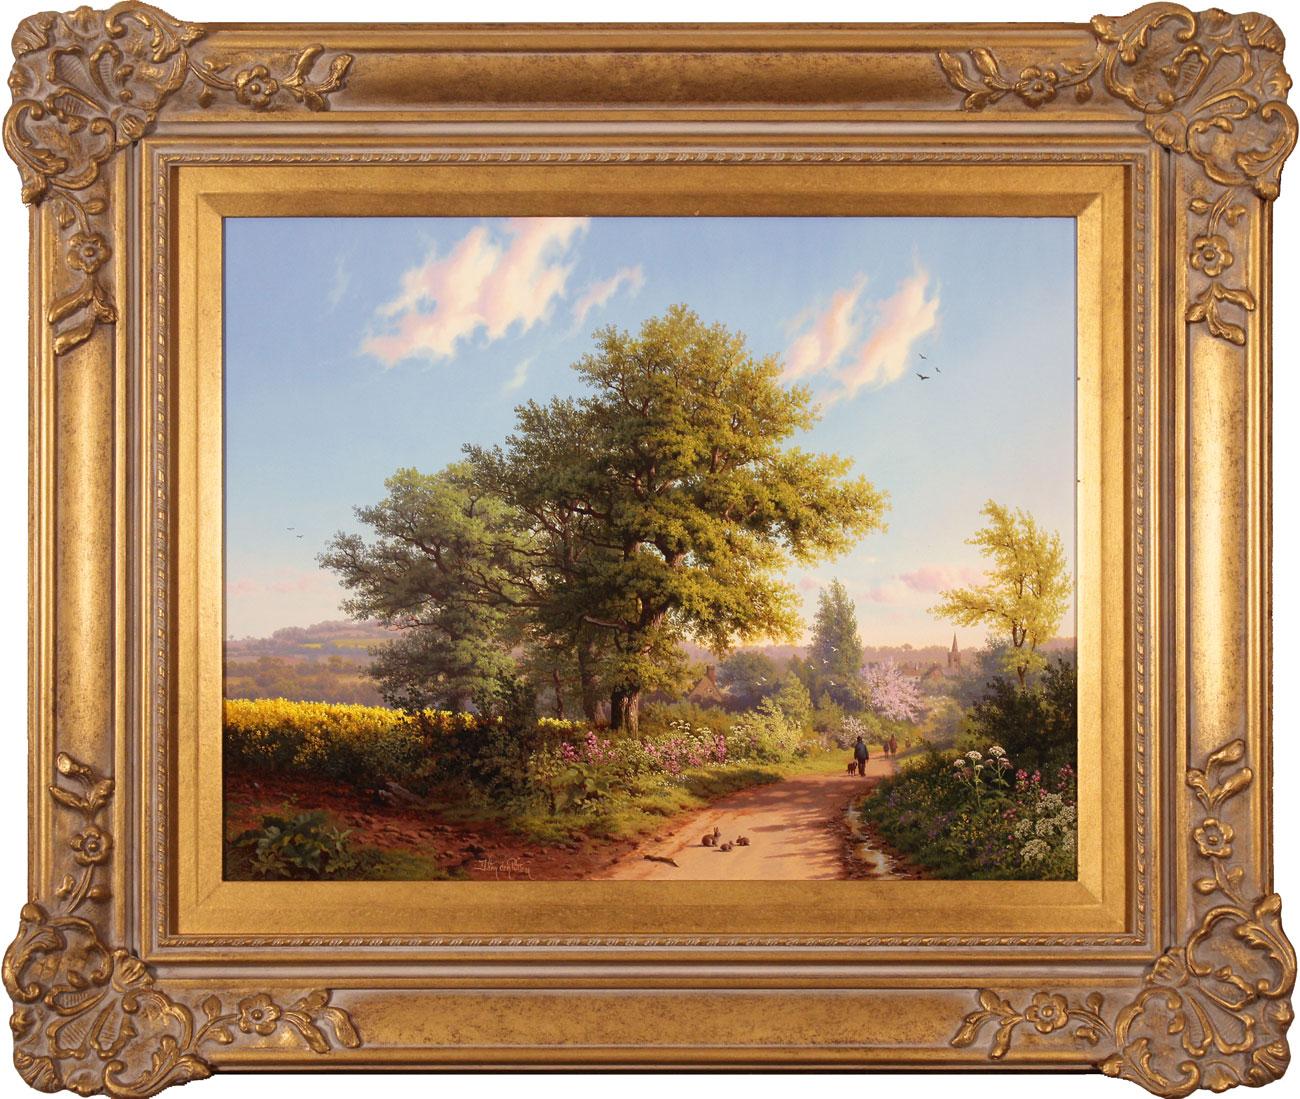 Daniel Van Der Putten, Original oil painting on panel, Road to Daventry in Spring Click to enlarge